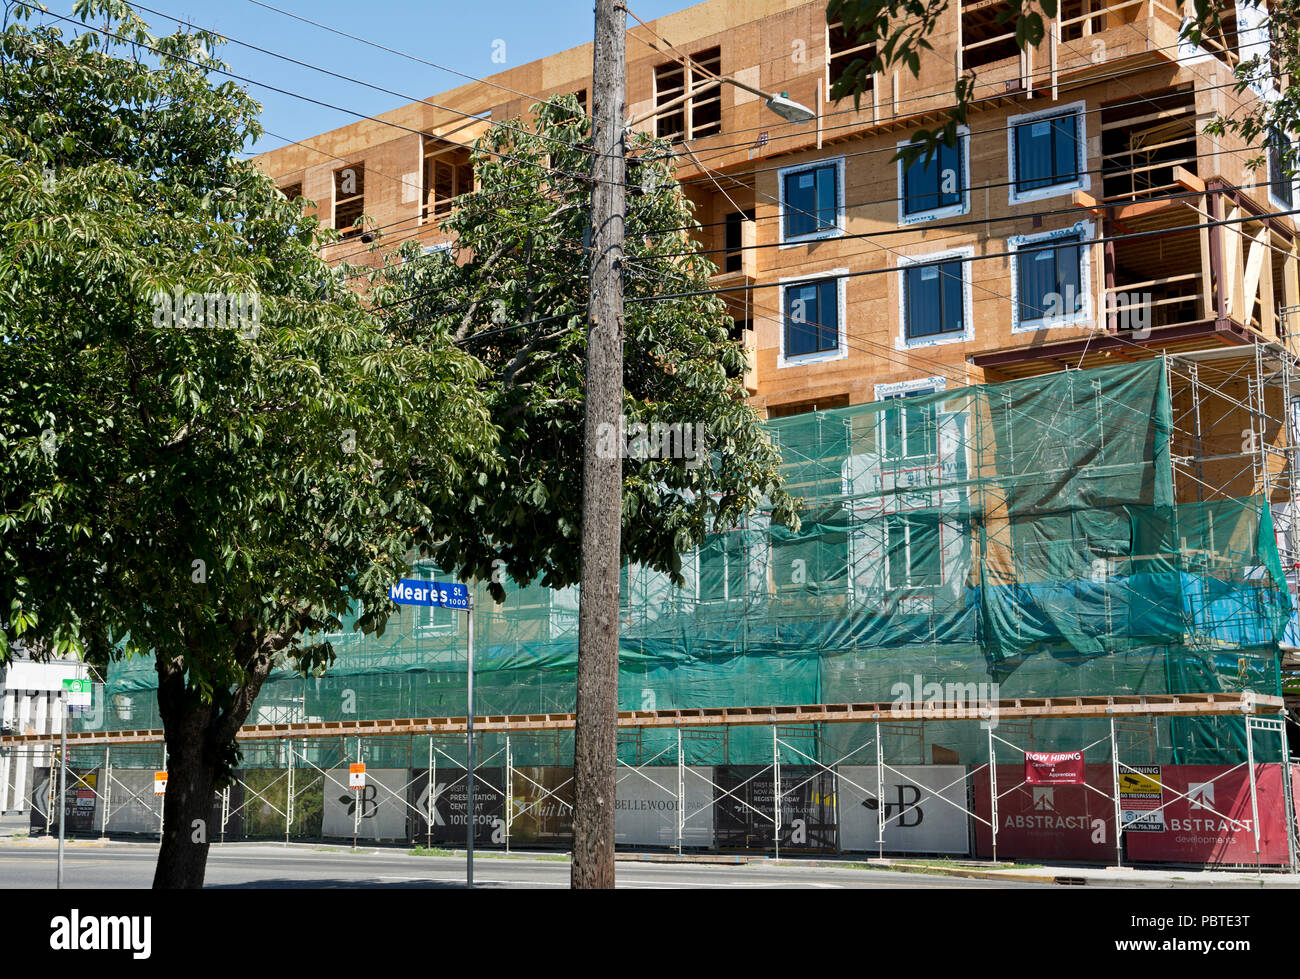 Condo development in Victoria, BC, Canada.  Apartments flats under construction. - Stock Image